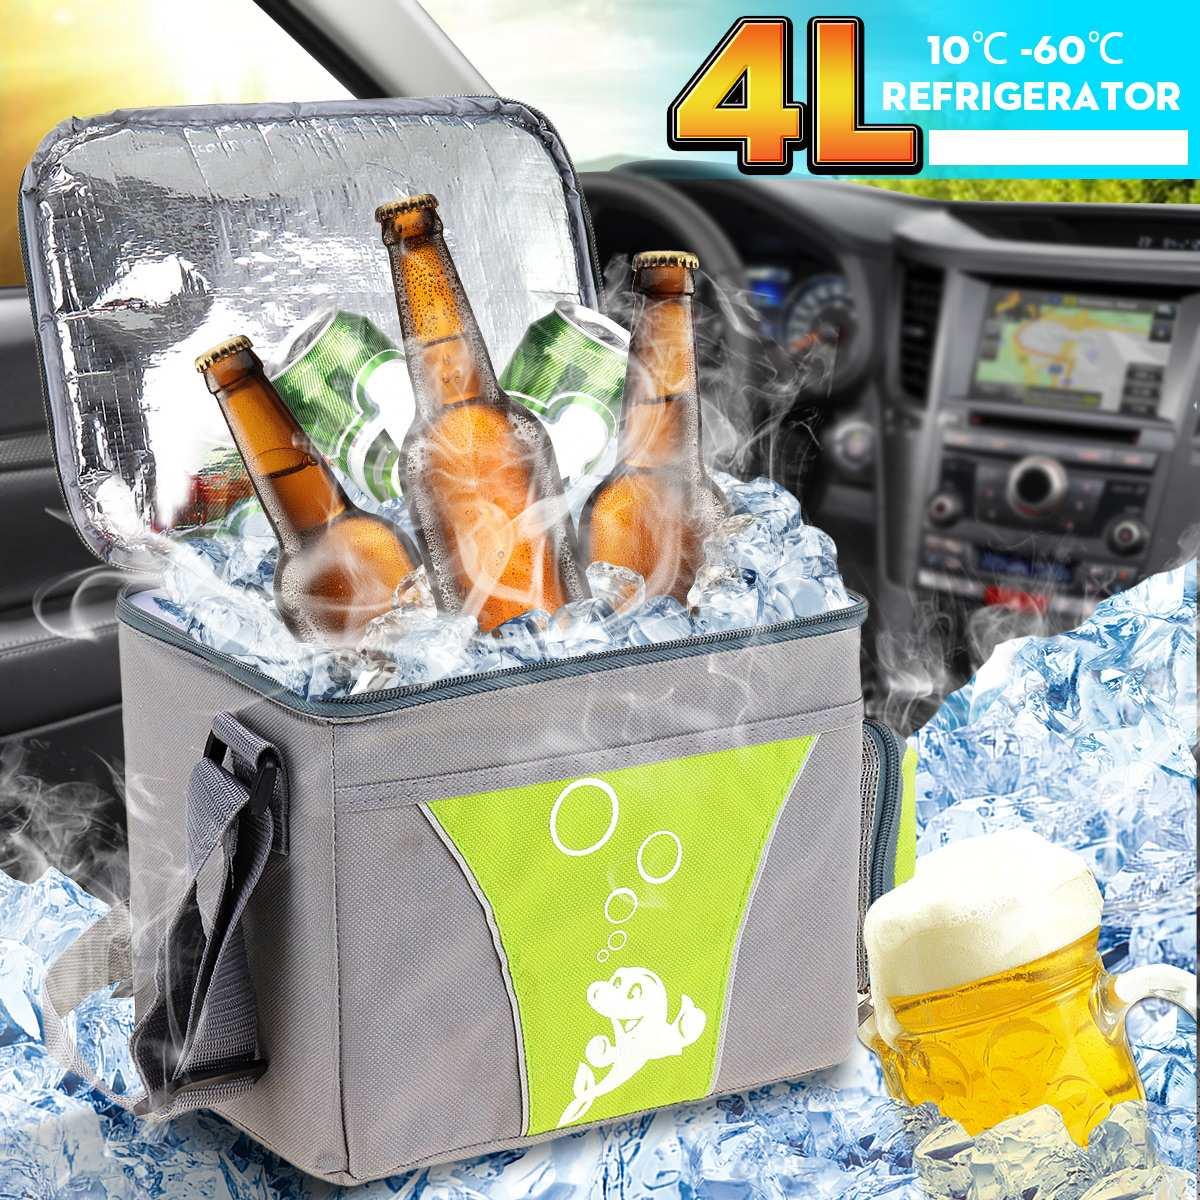 Fridge Refrigerator Car-Cooling-Heating-Box Cars Ultra-Quiet Camping Mini 12V Home 4L